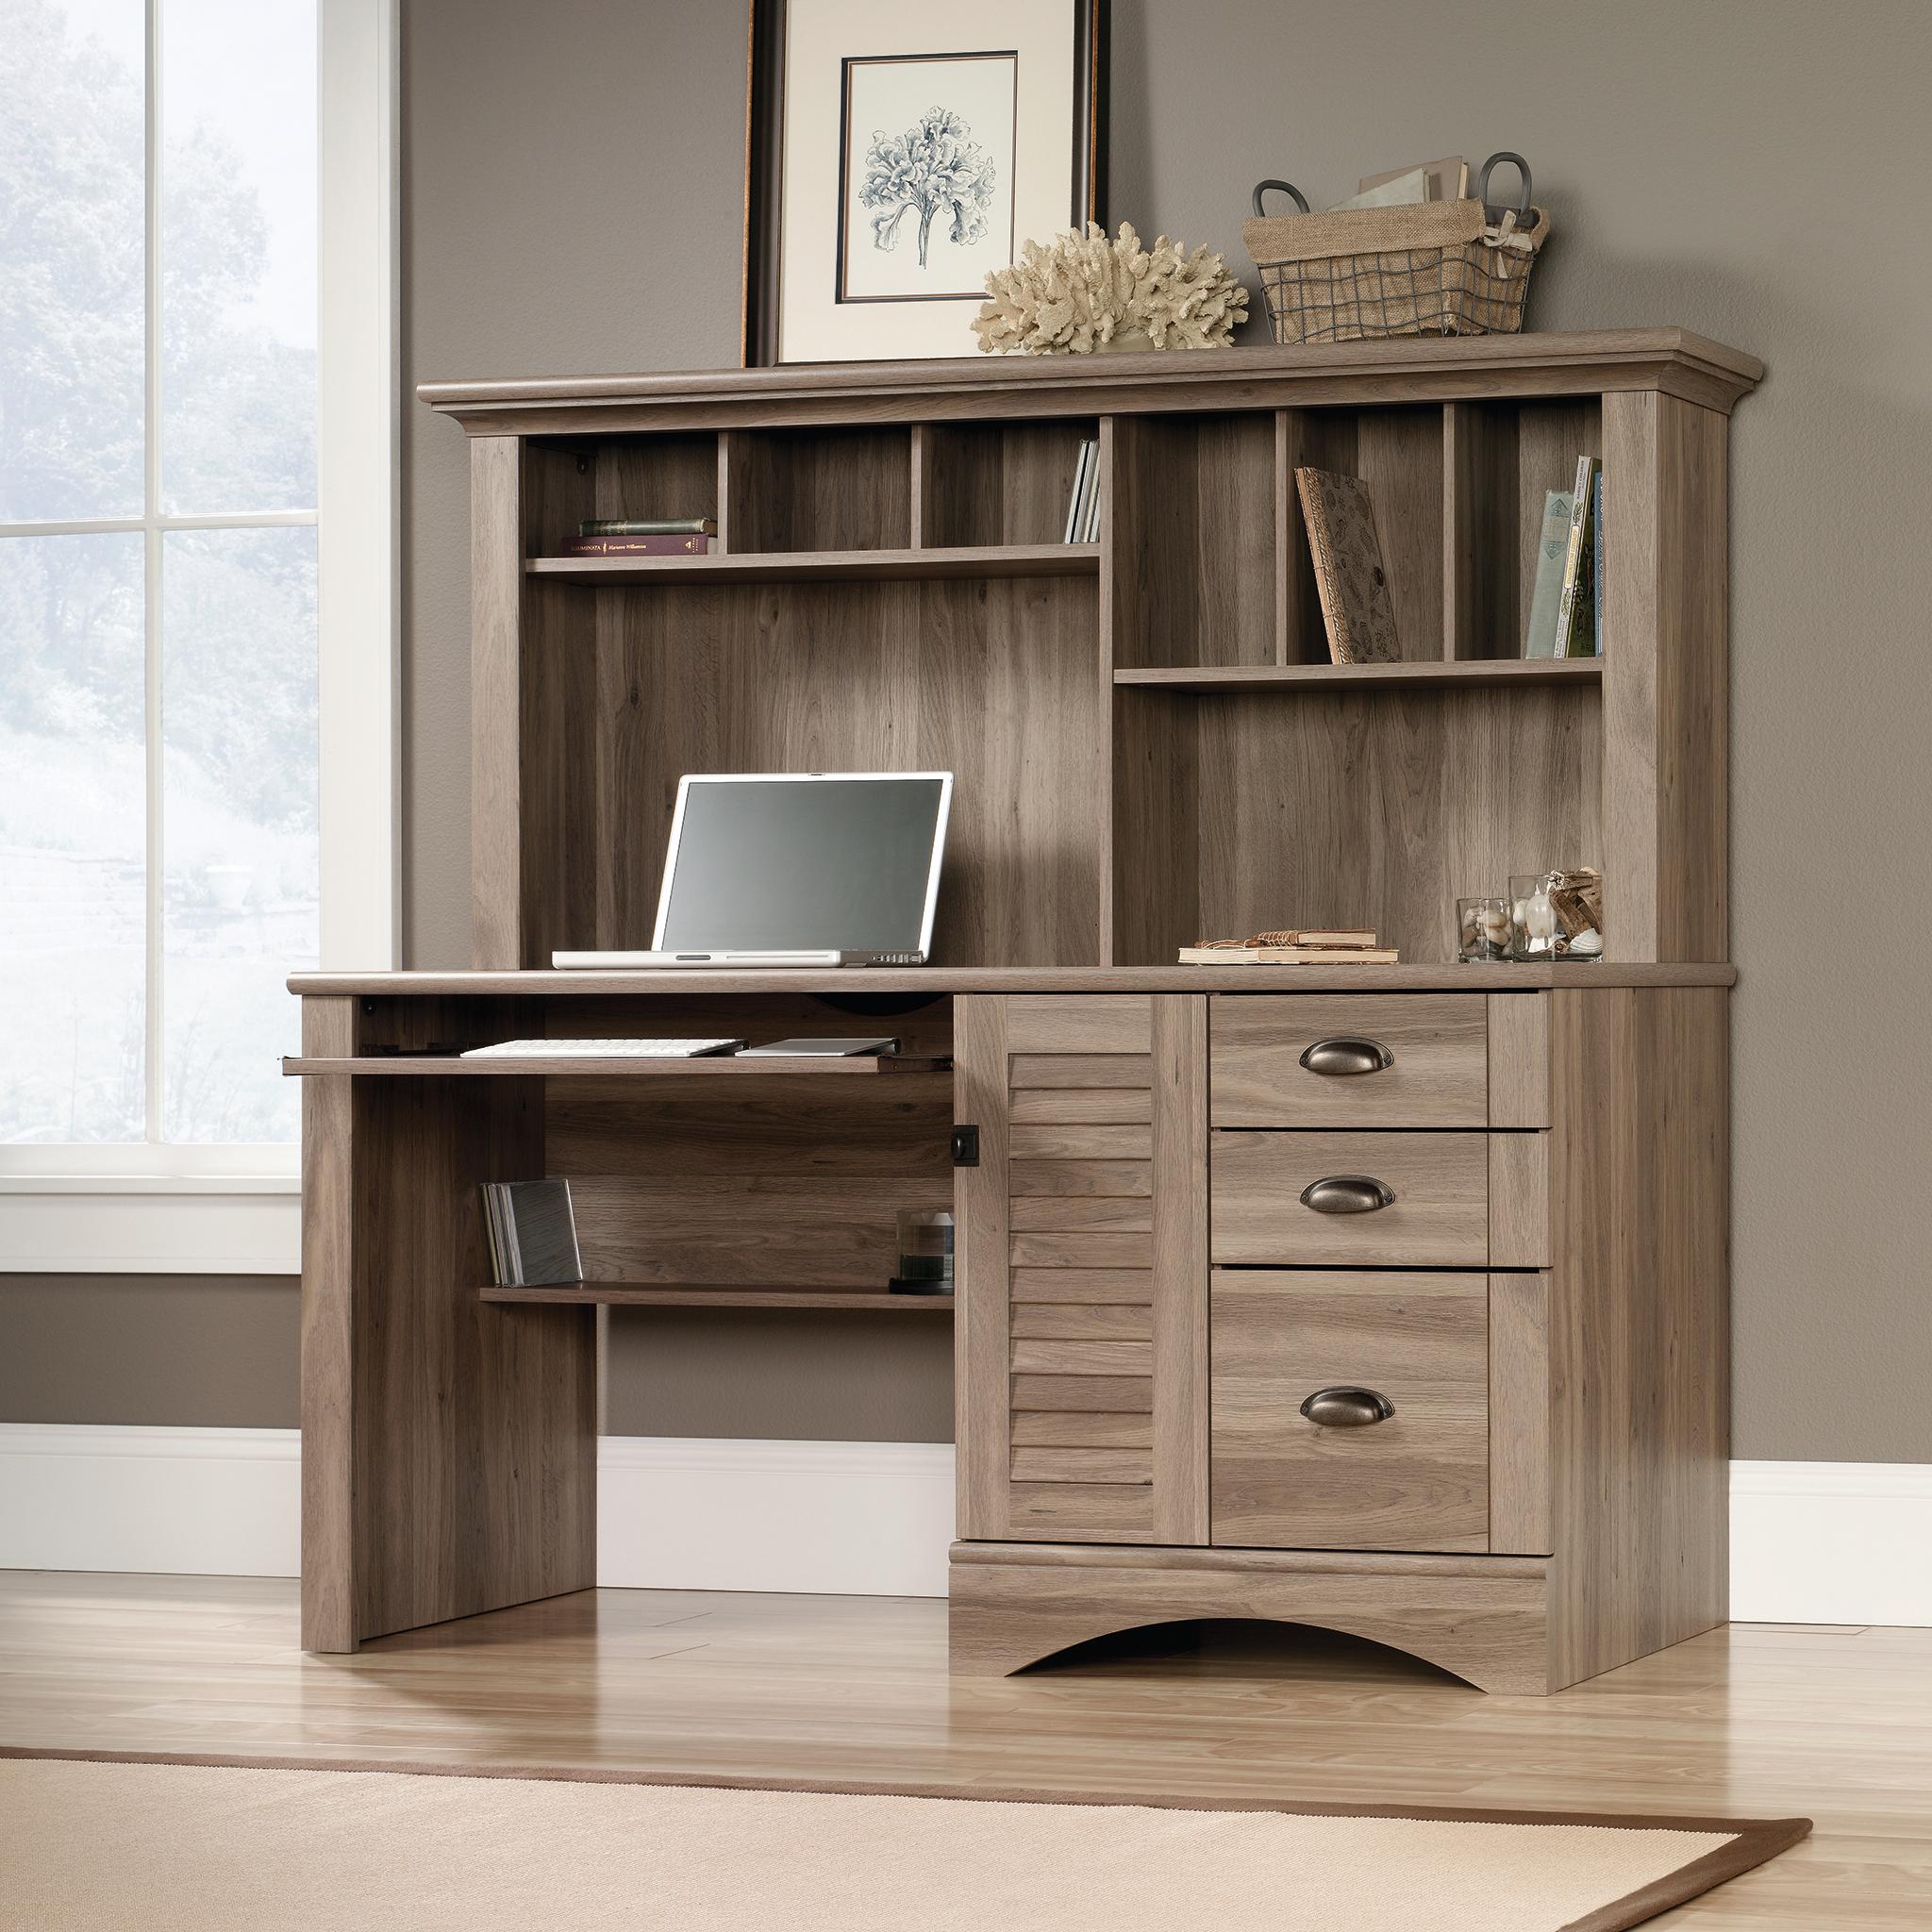 Teknik Office Louvre Hutch Desk in a Salt Oak Finish; slide out keyboard / mouse shelf; multiple storage cubbyholes within the hutch and a filer drawe